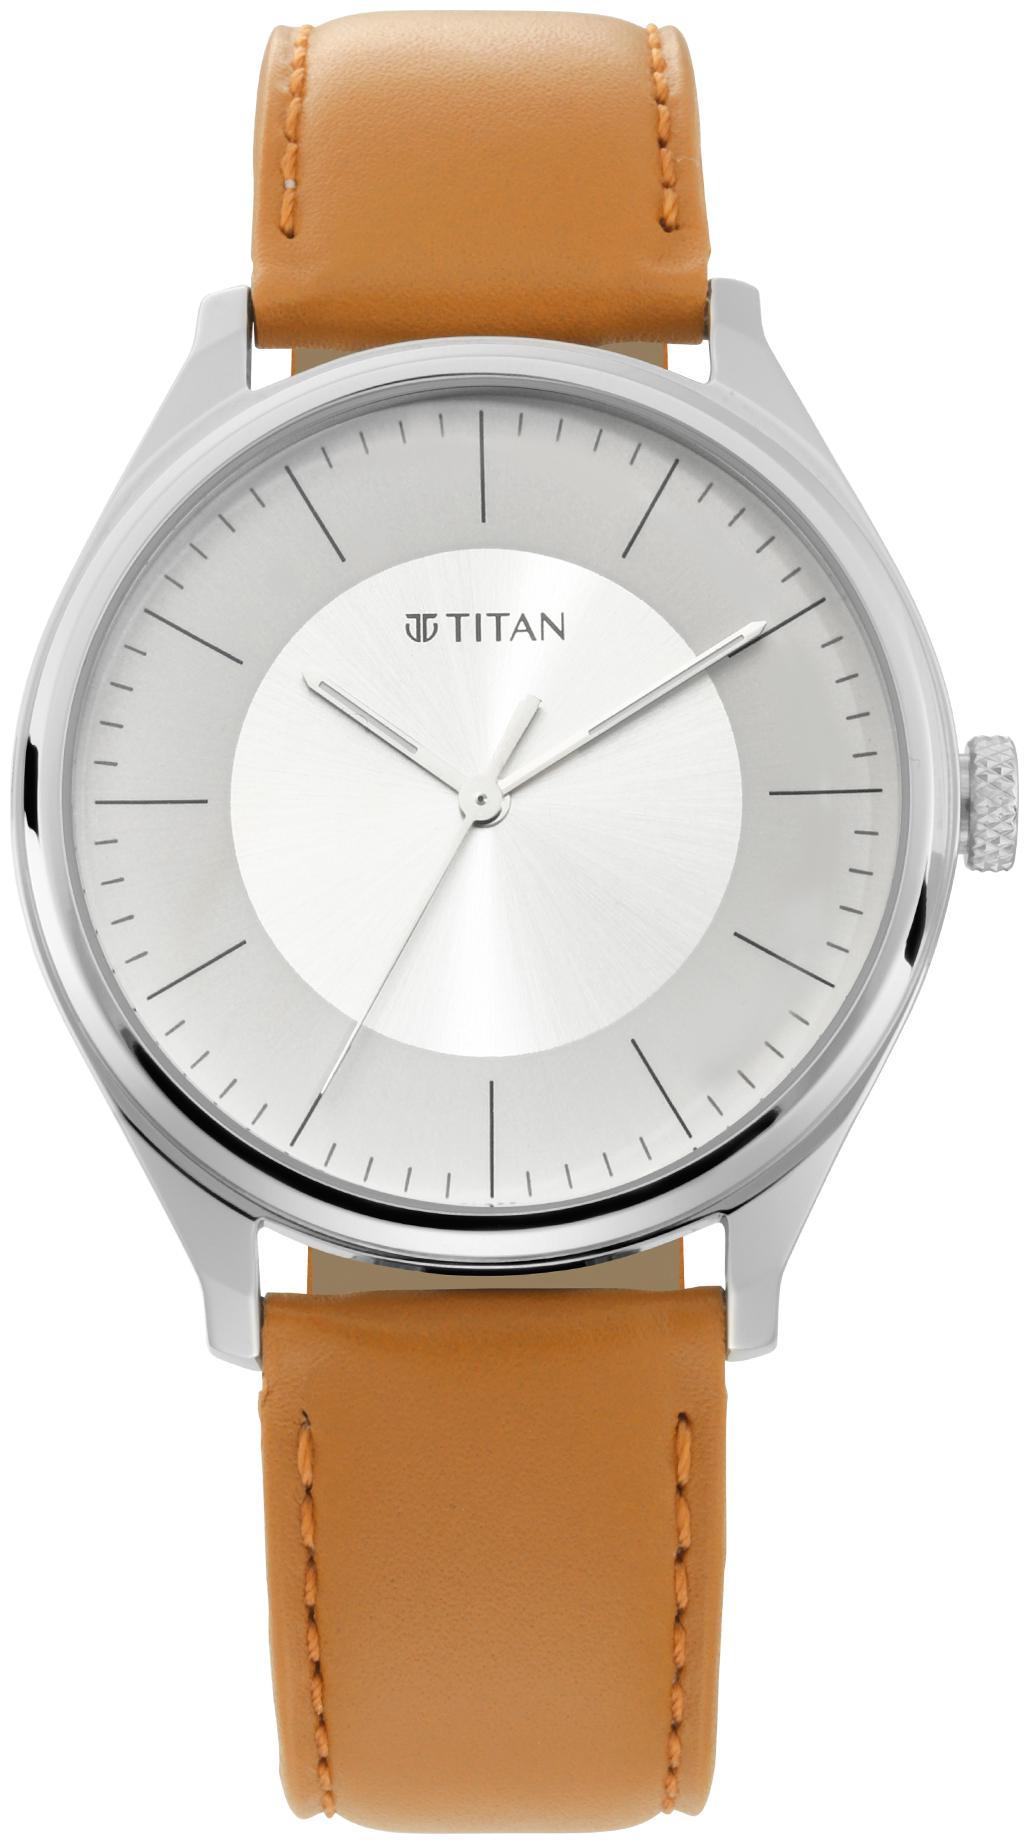 Titan Neo 1802SL07 Analog Watch for Men by Titan Company